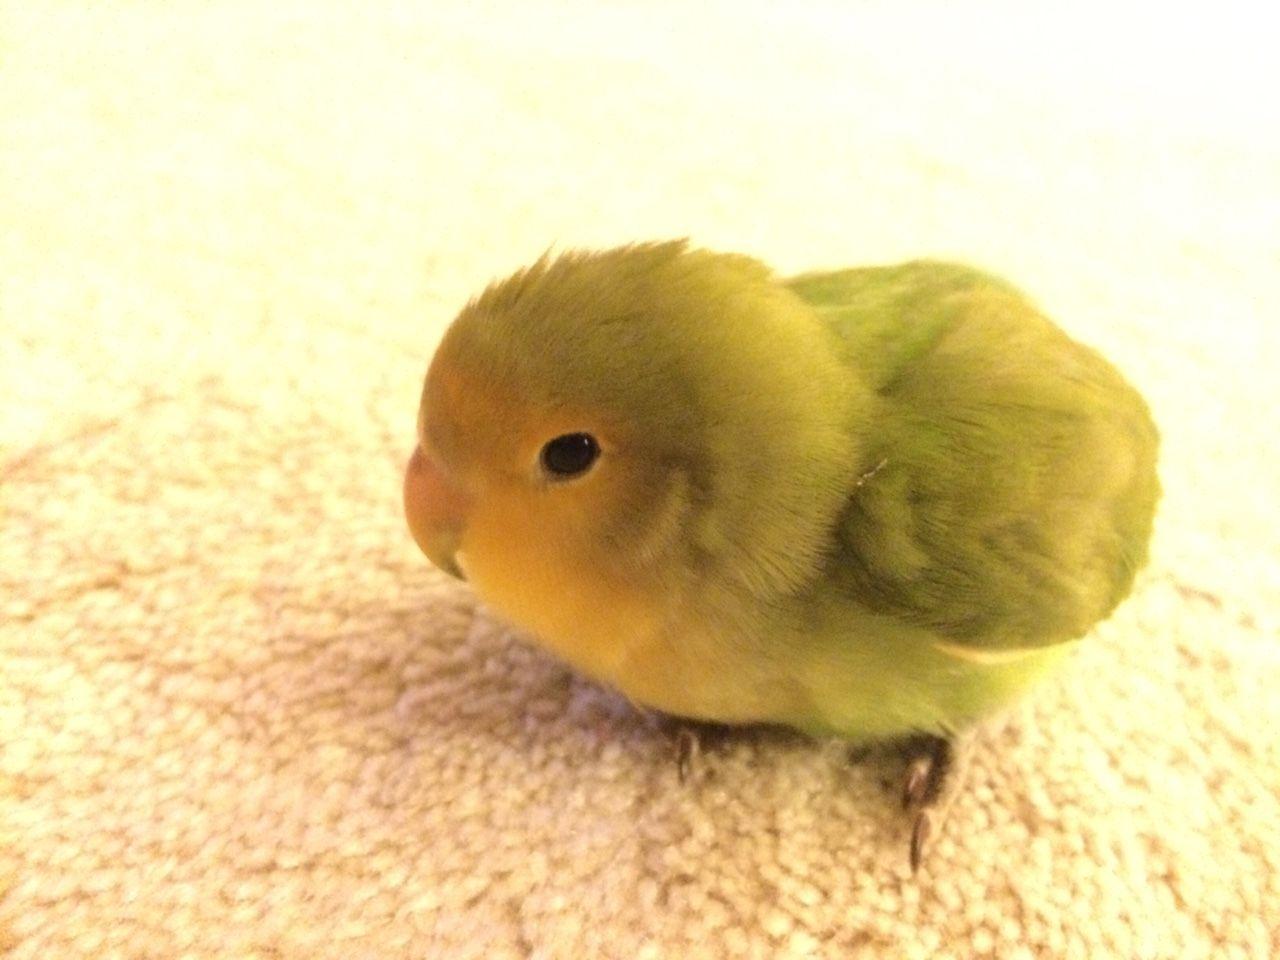 Green Marshmallow Or Bird I M Not Sure Mod Marshmallow Bird